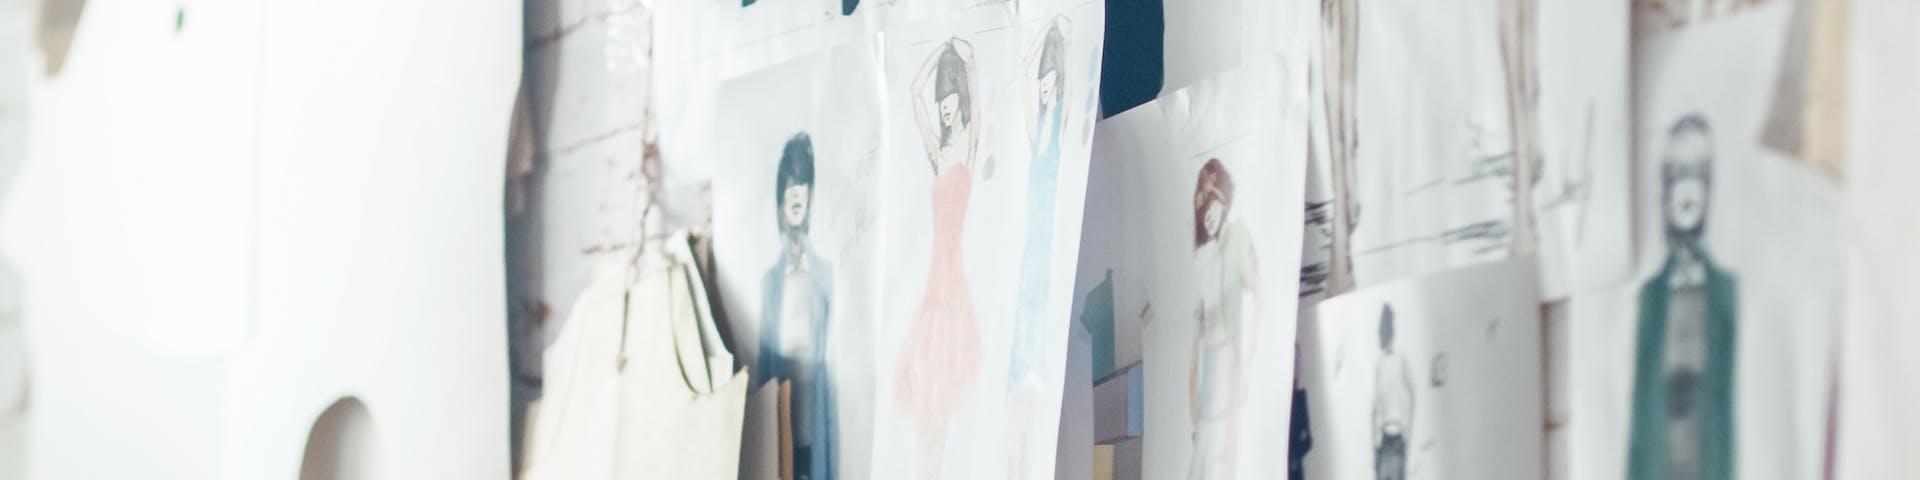 Best Fashion Design Schools In Europe In 2020 Mastersportal Com